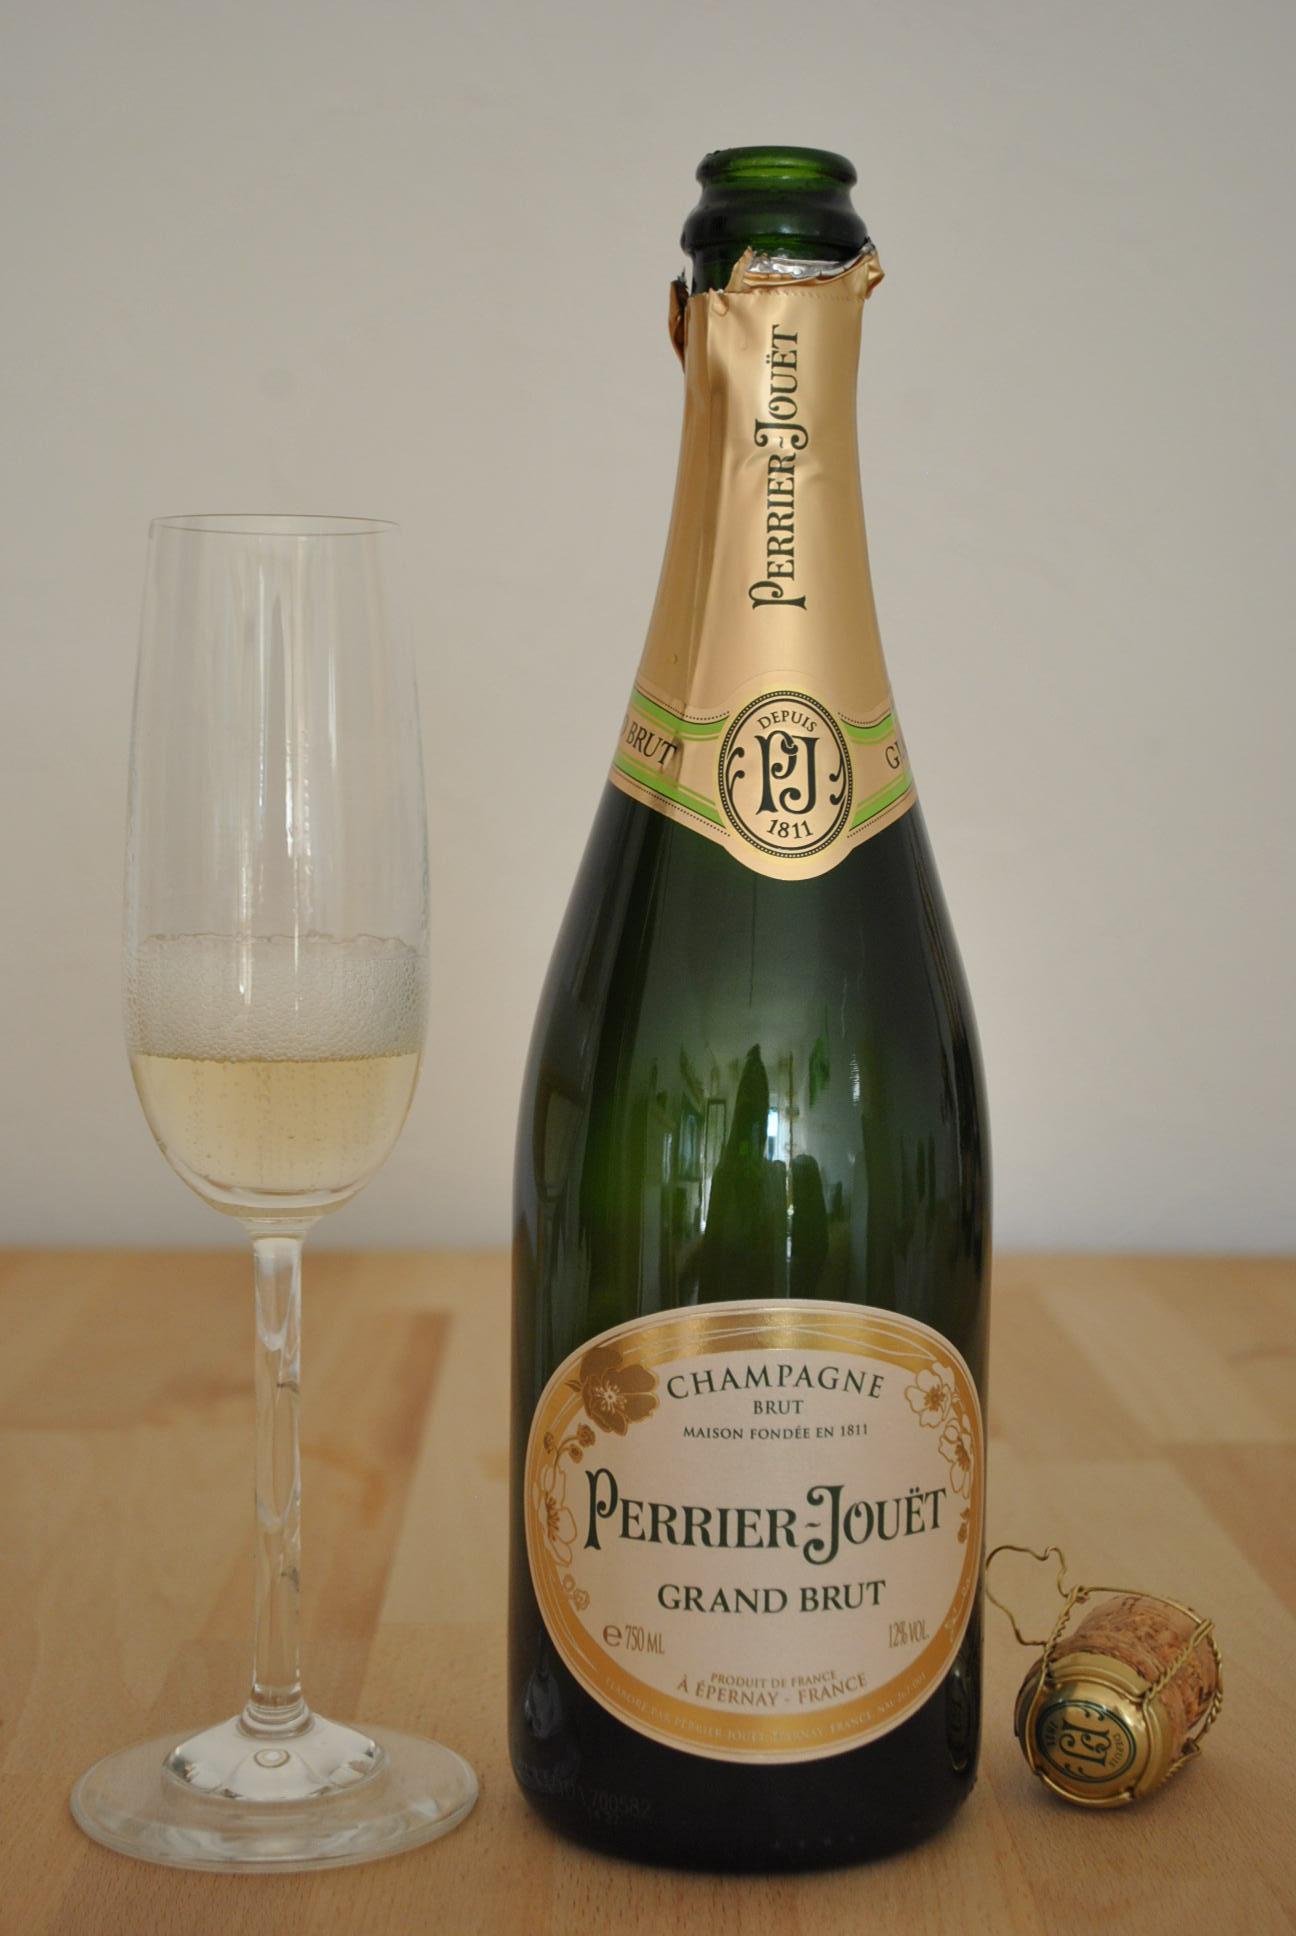 Perrier Jouet – Grand Brut Champagner